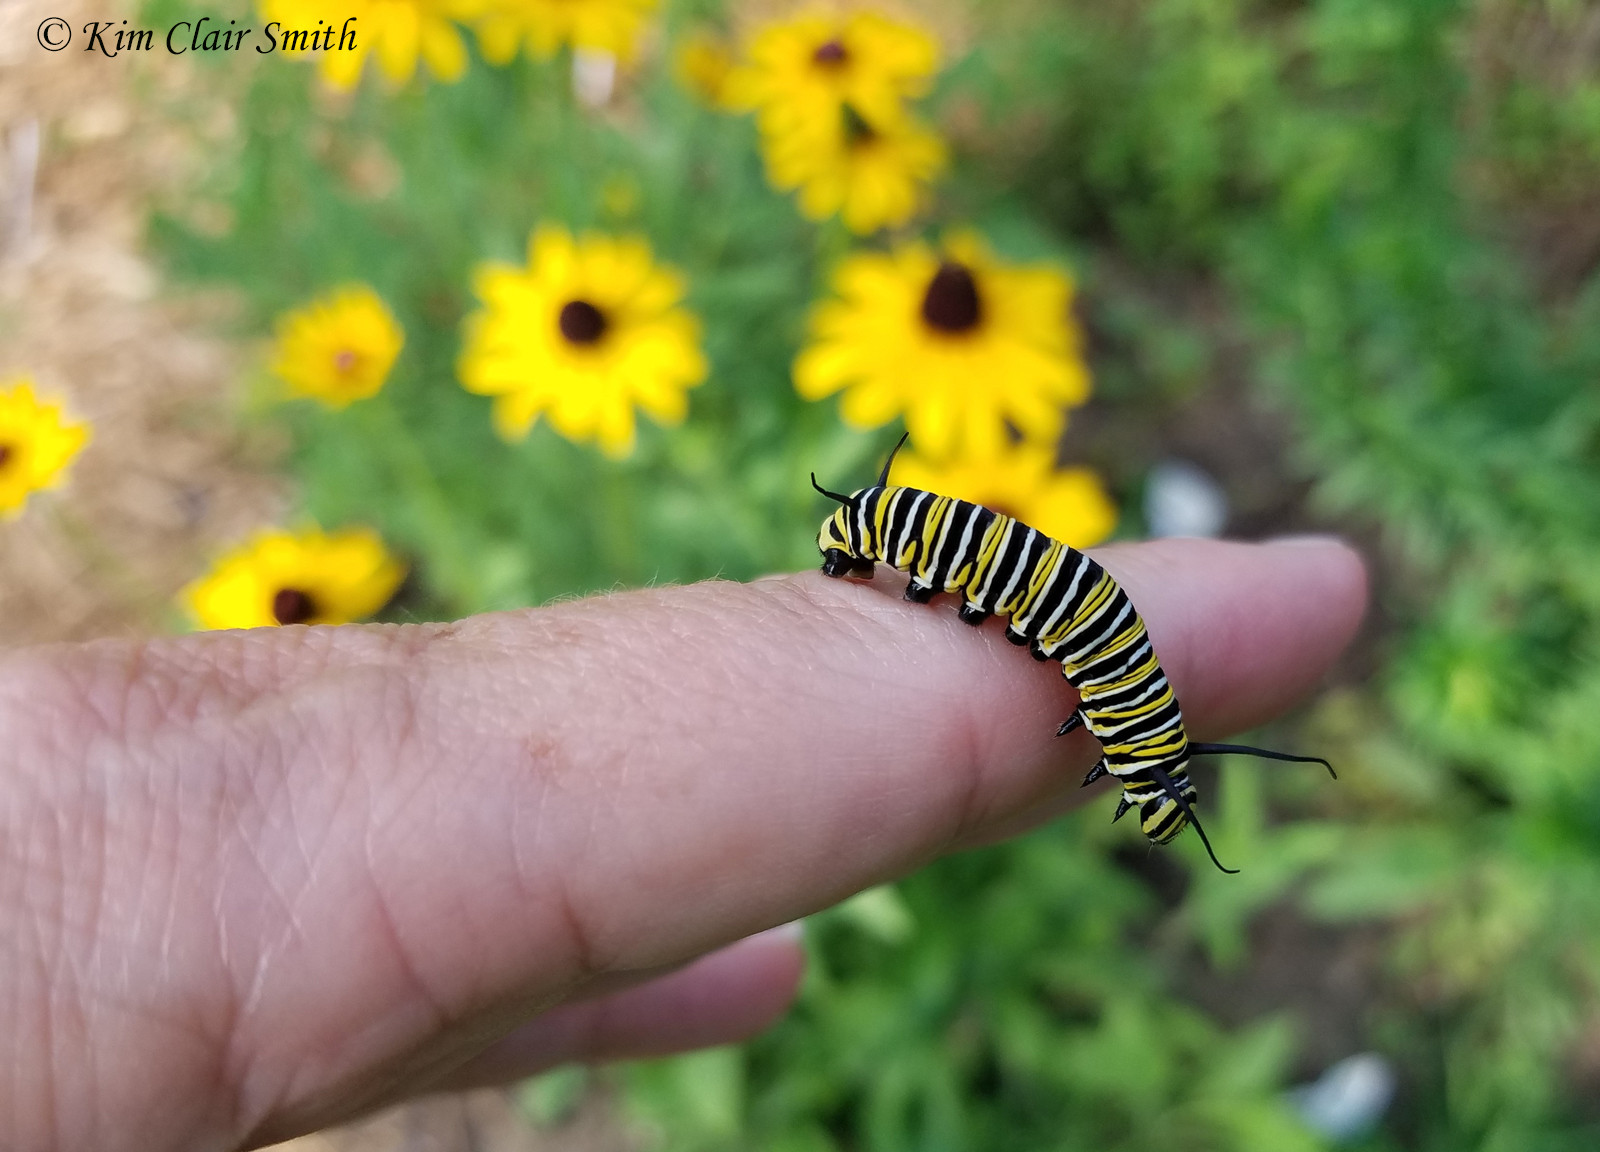 Fifth instar monarch caterpillar on my hand w sig